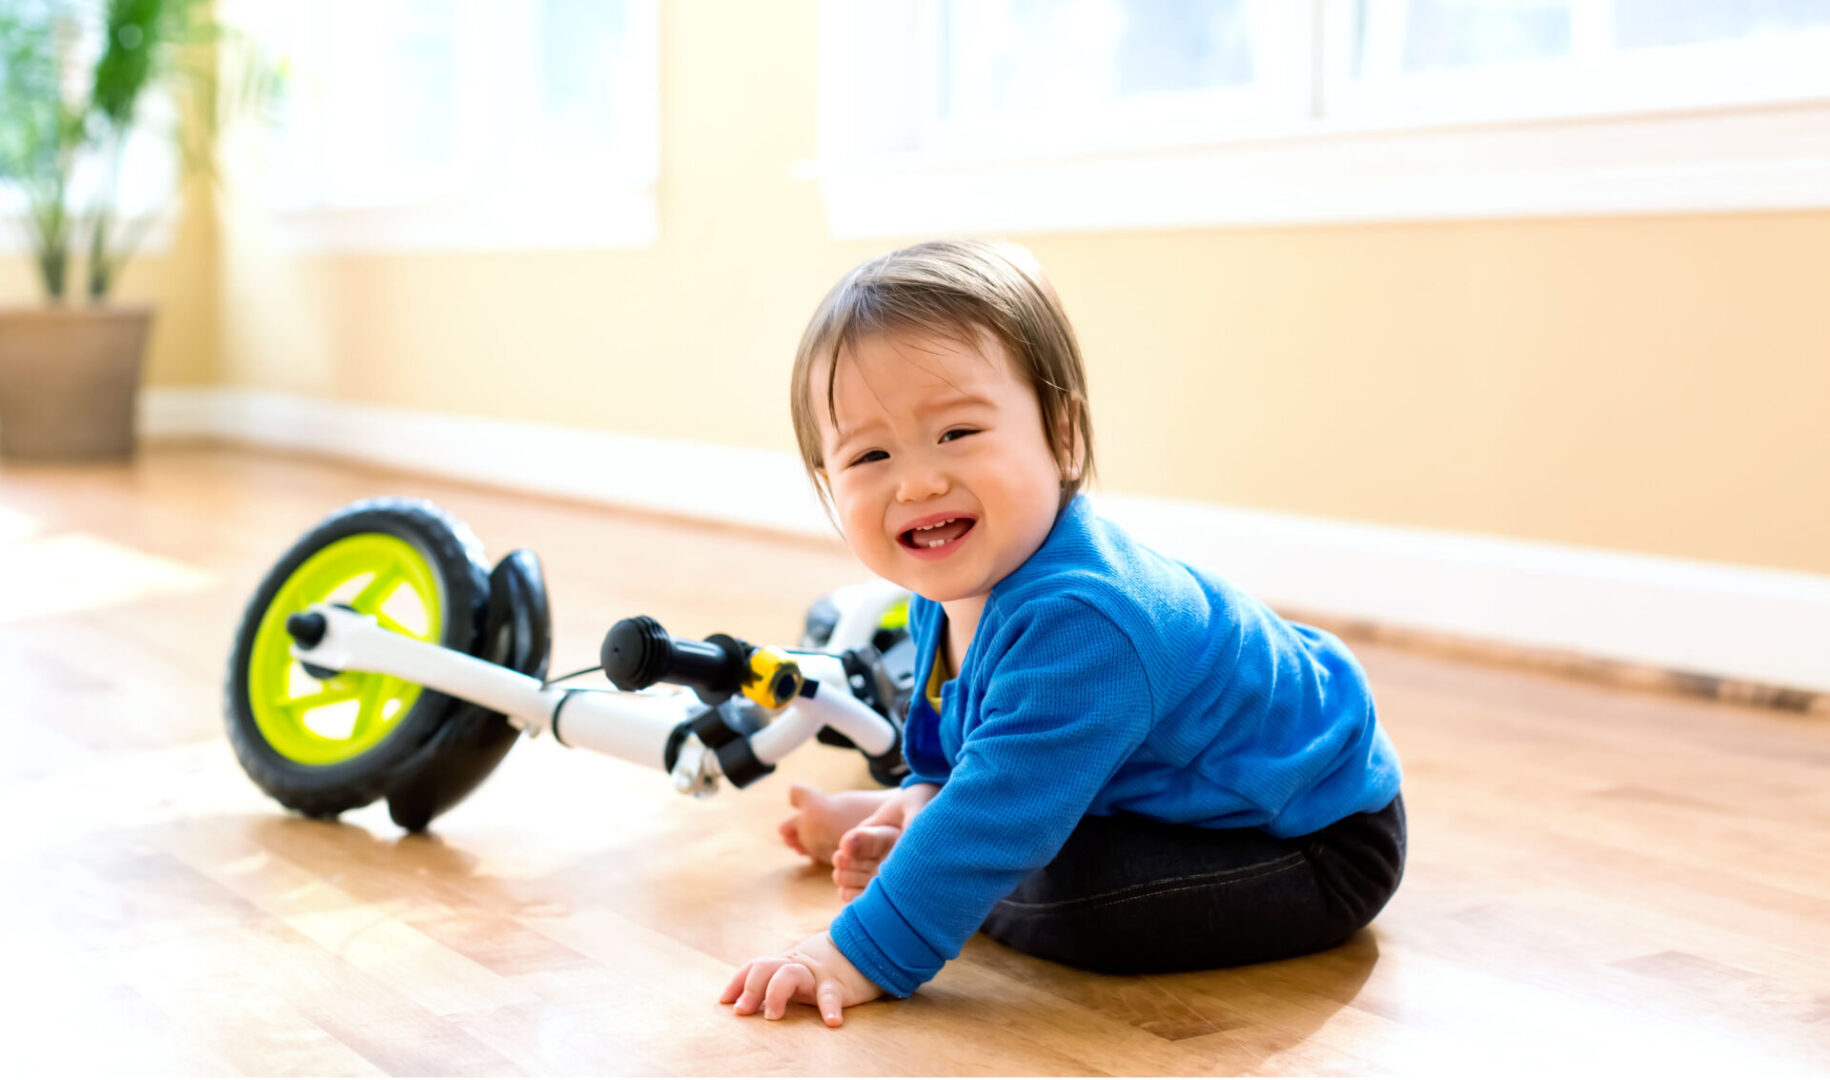 Baby on the floor with bike